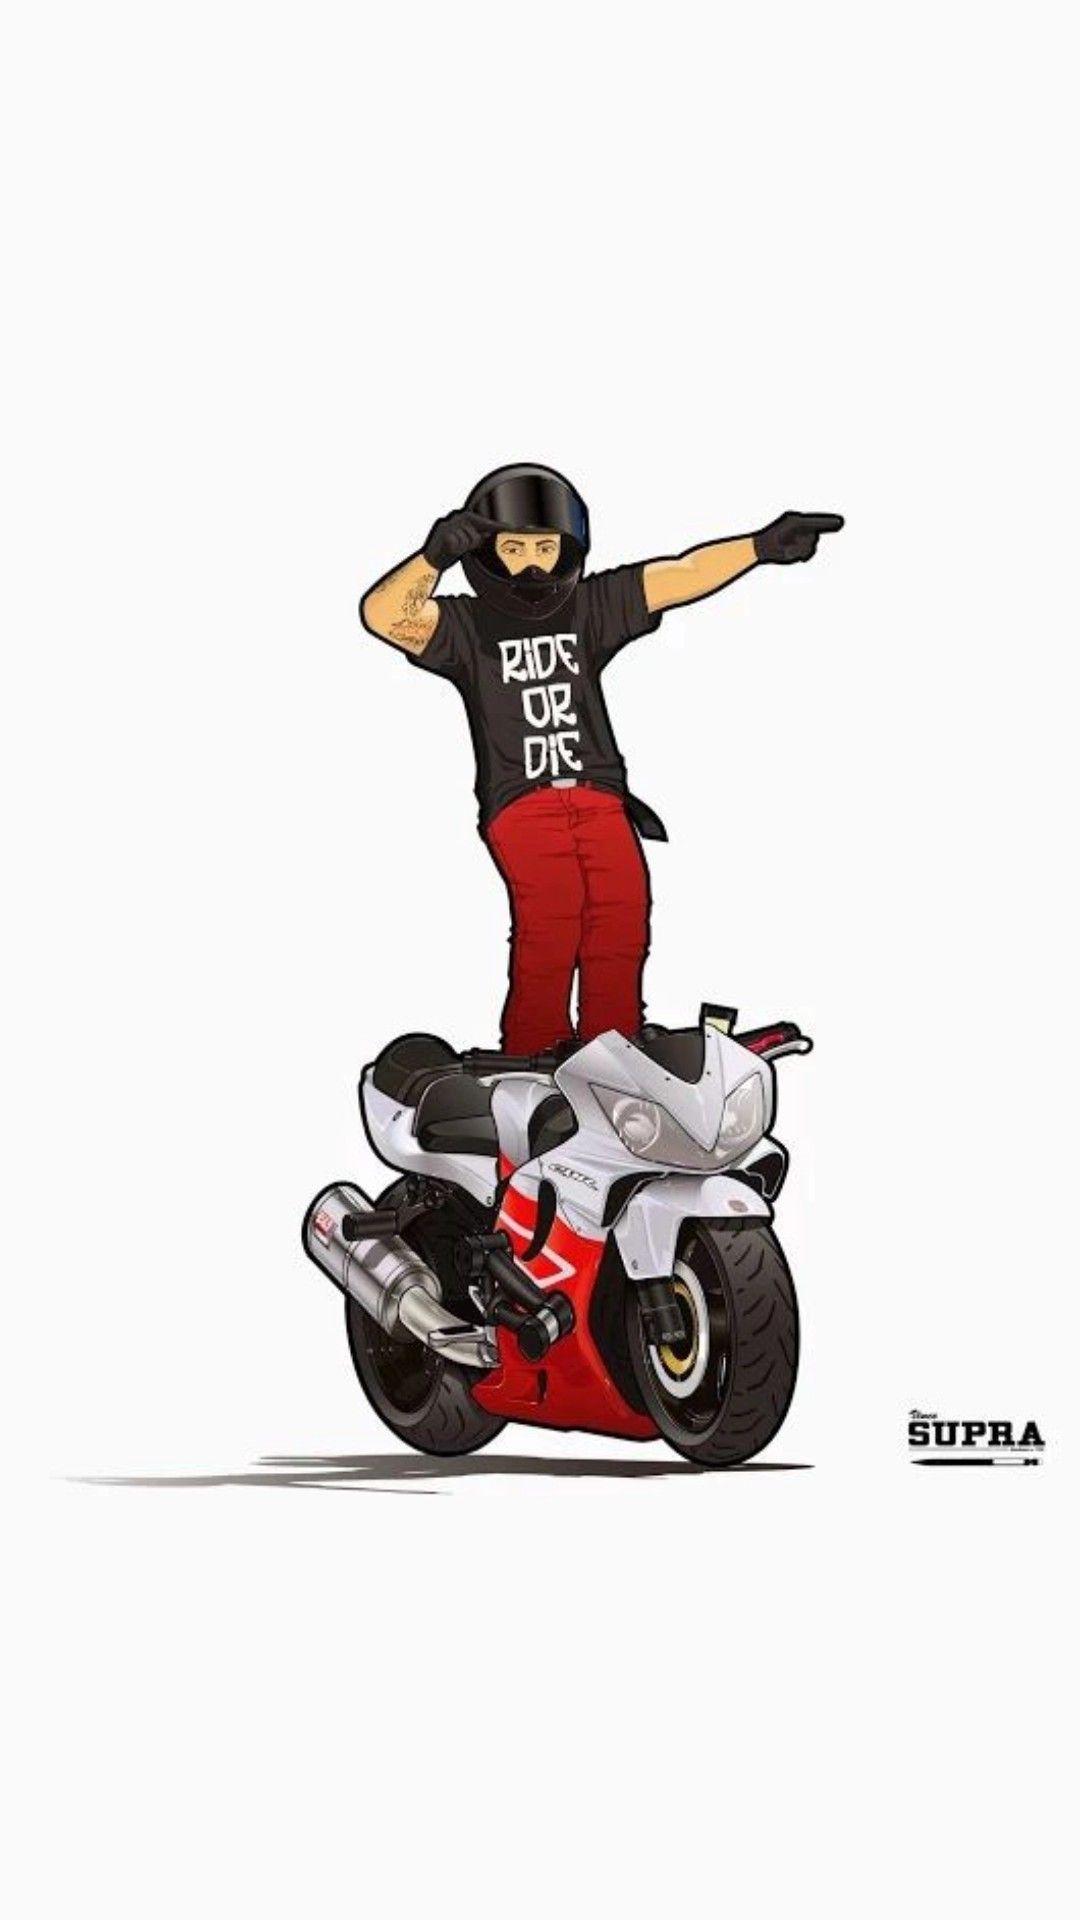 Pin By Mr Vishal On Bikelover Vintage Motorcycle Art Cartoon